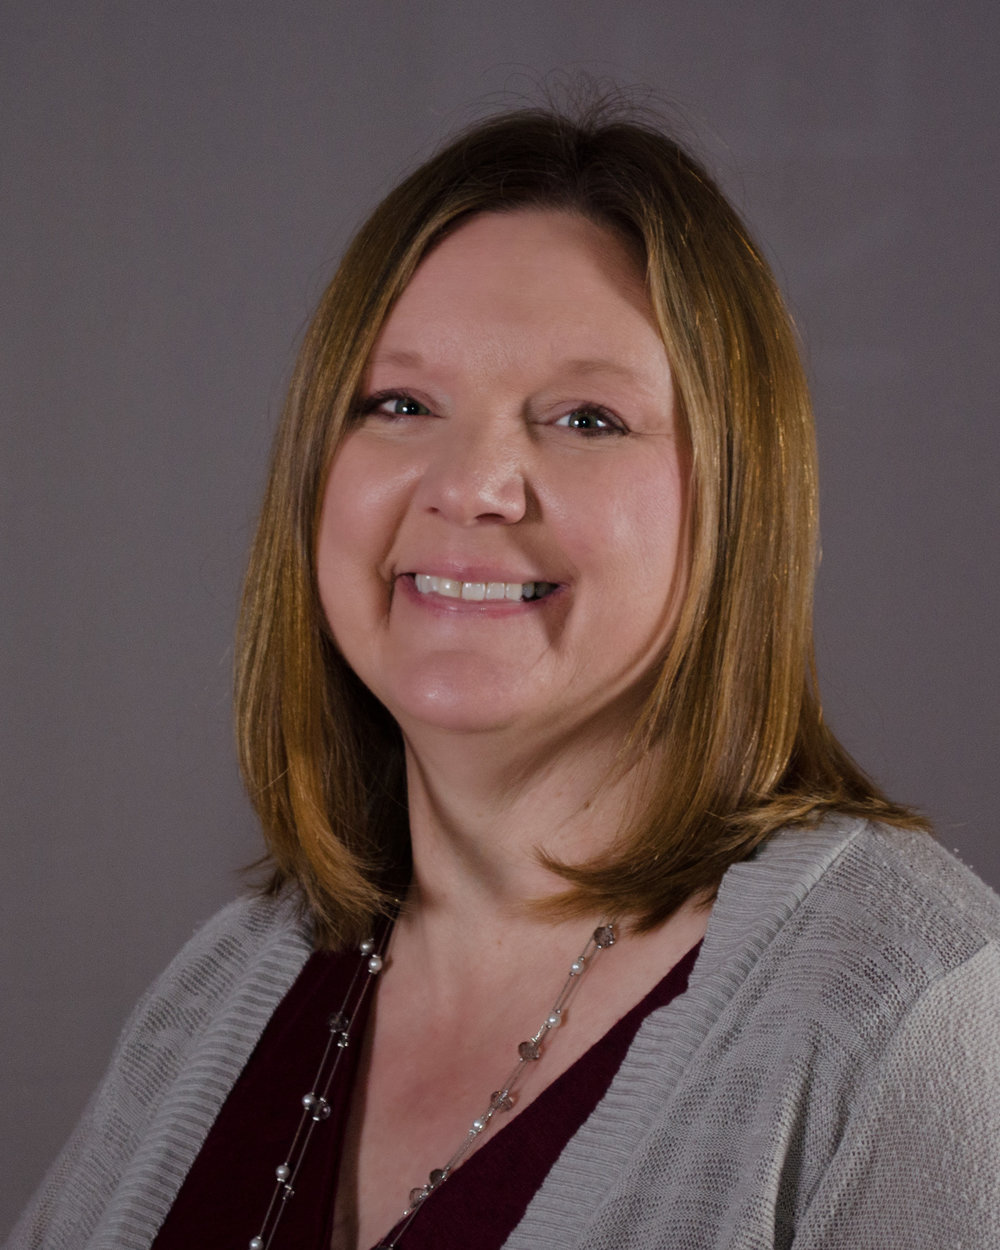 Helen Parks, Associate Pastor